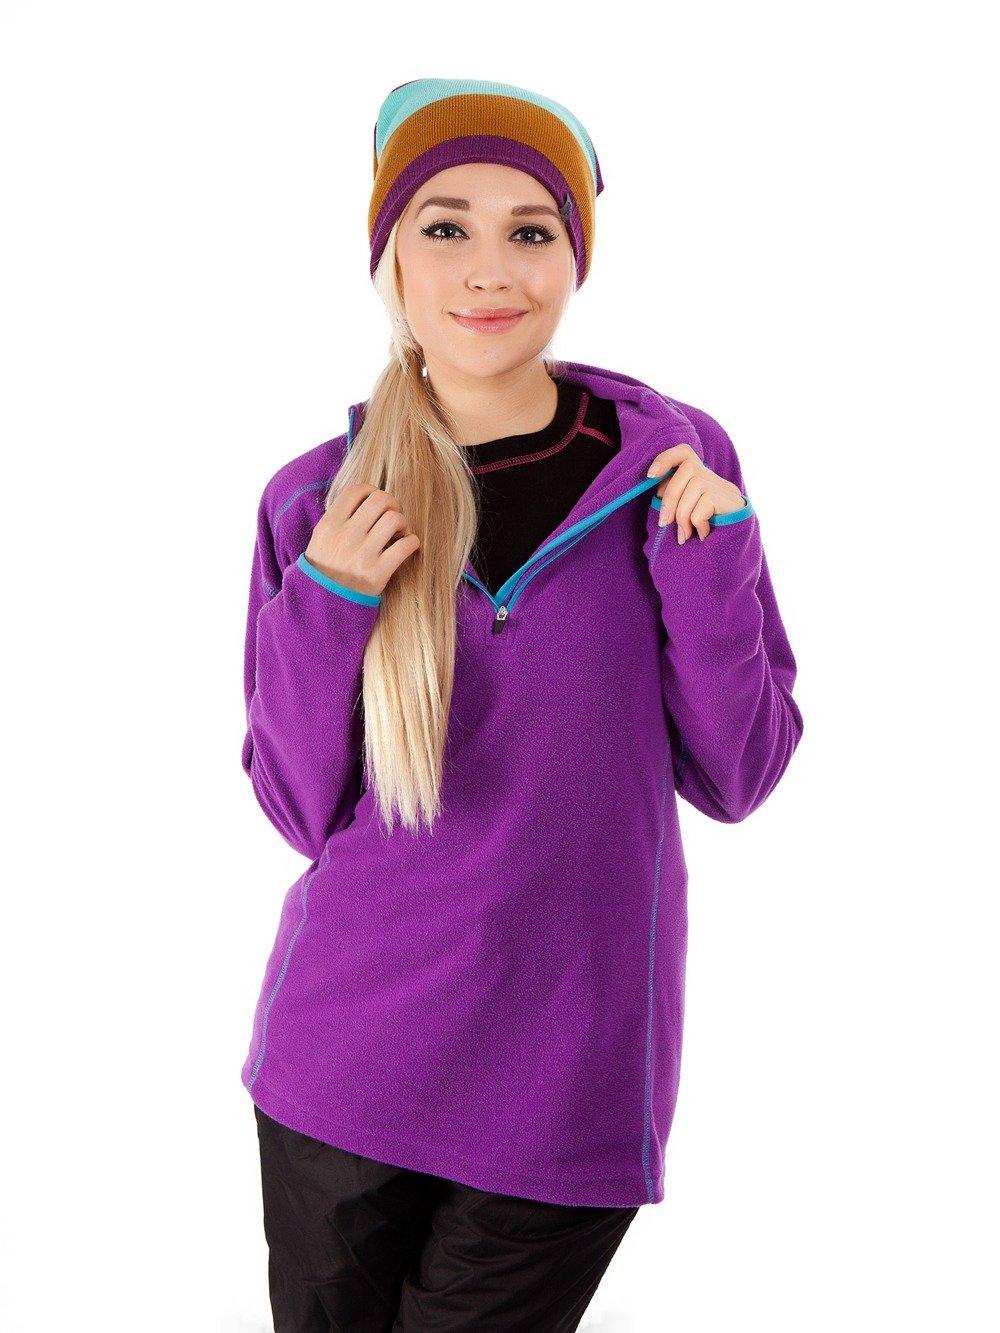 Typhoon – Typhoon st. moritz fleece trøje børn fra billigsport24